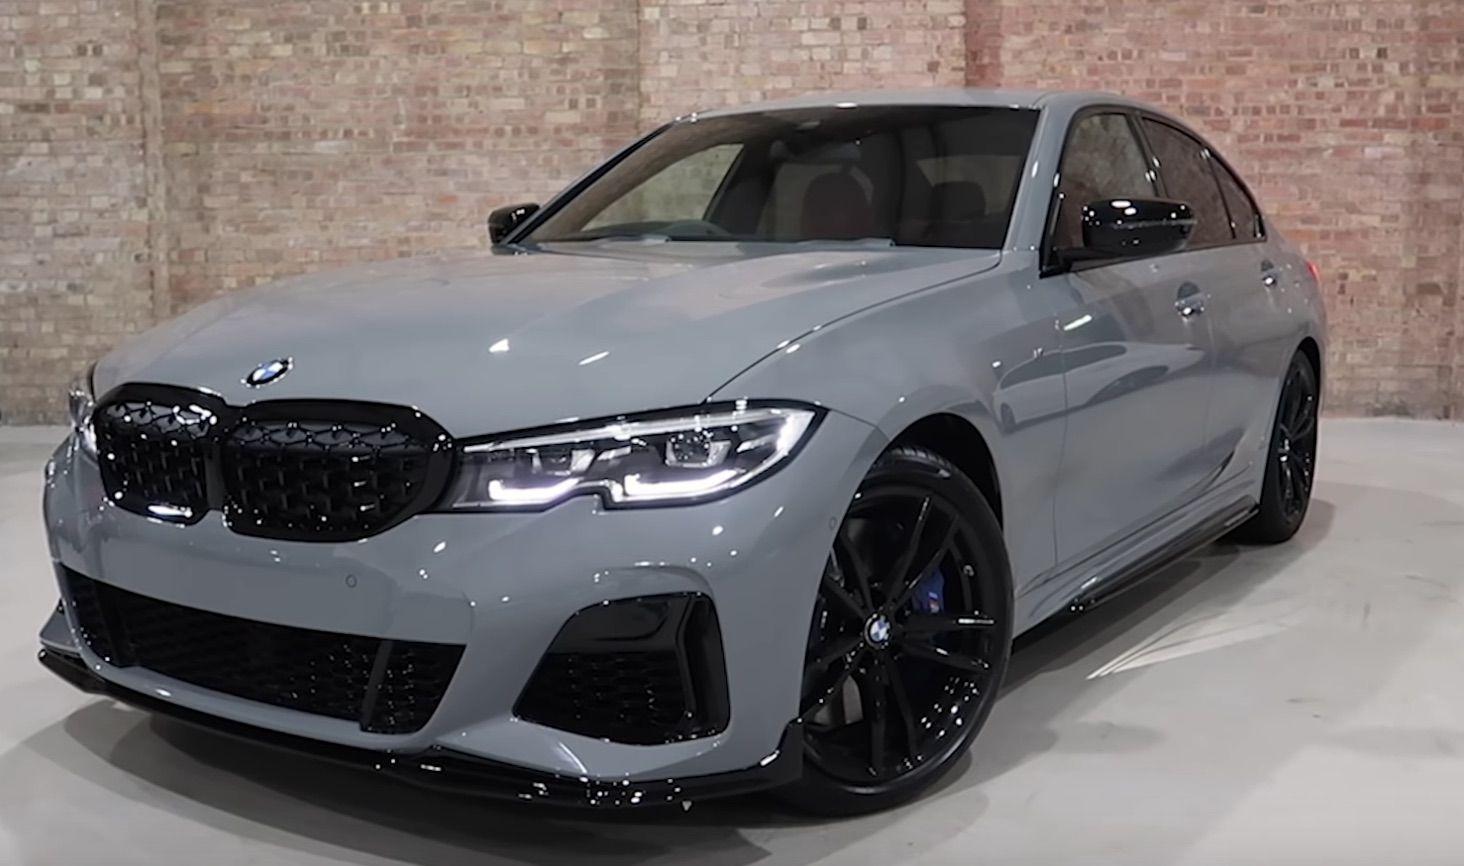 This 2020 Nardo Grey Bmw M340i Is One Of A Kind In 2020 Bmw Dream Cars Bmw Nardo Grey